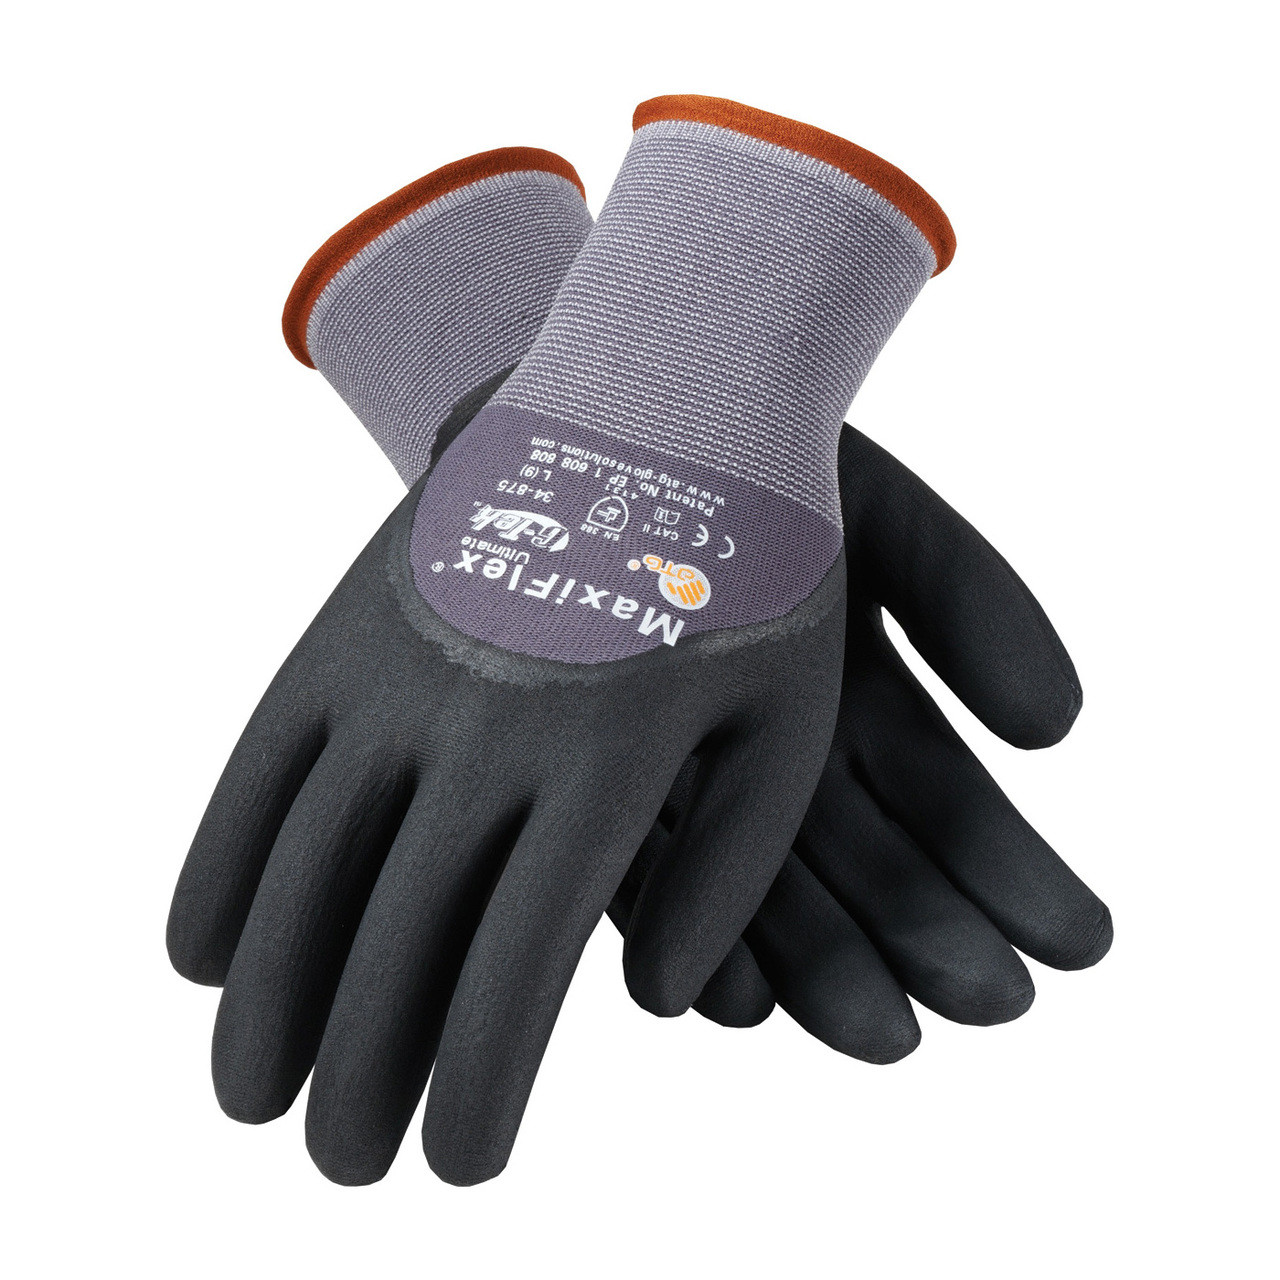 MaxiFlex 34-875 Gloves Micro-Foam Grip on Palm Fingers Knuckles (Pair)